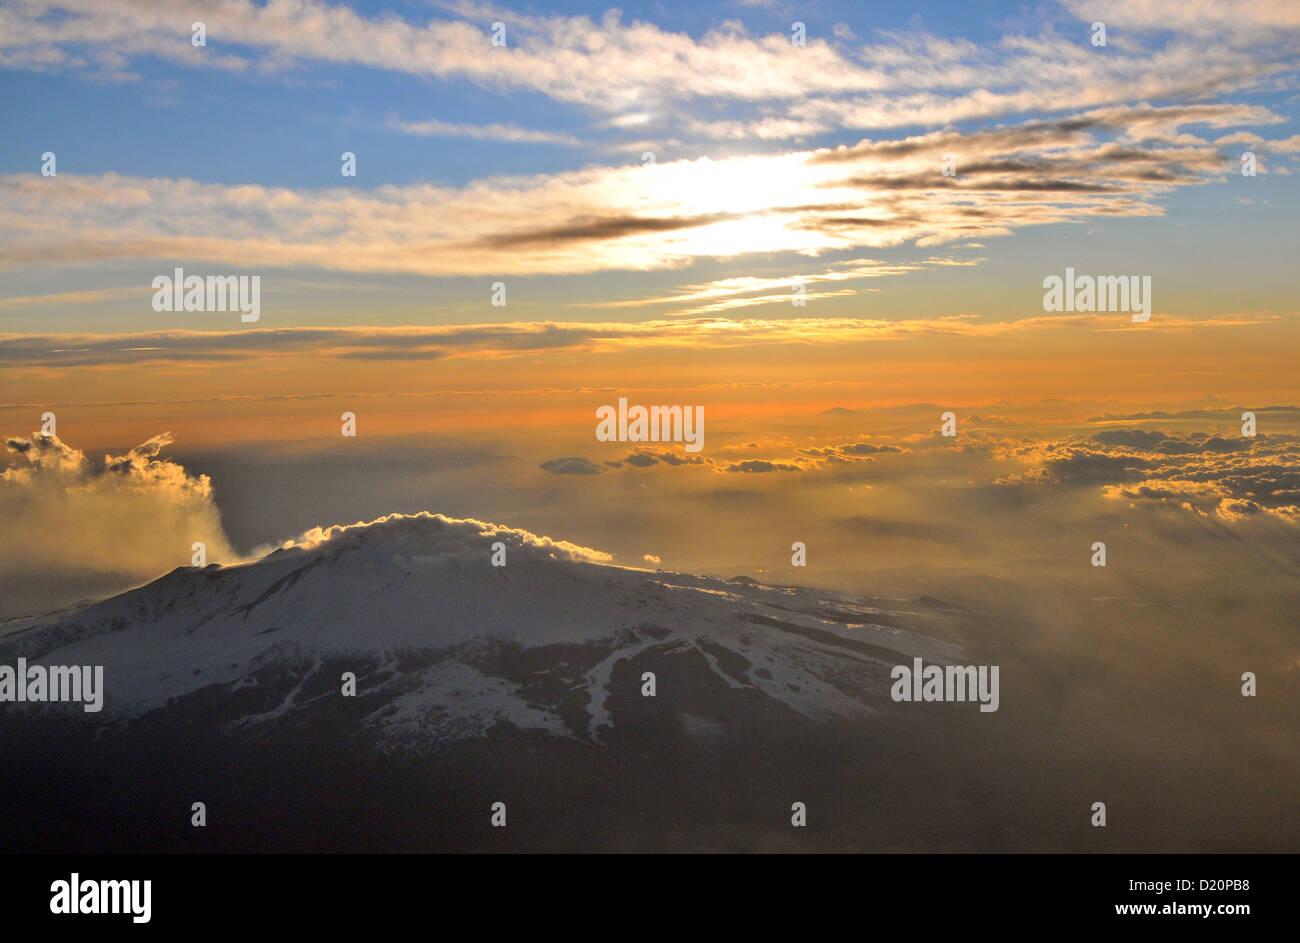 Volcano Etna from plane, eastcoast, Sicily, Italy - Stock Image